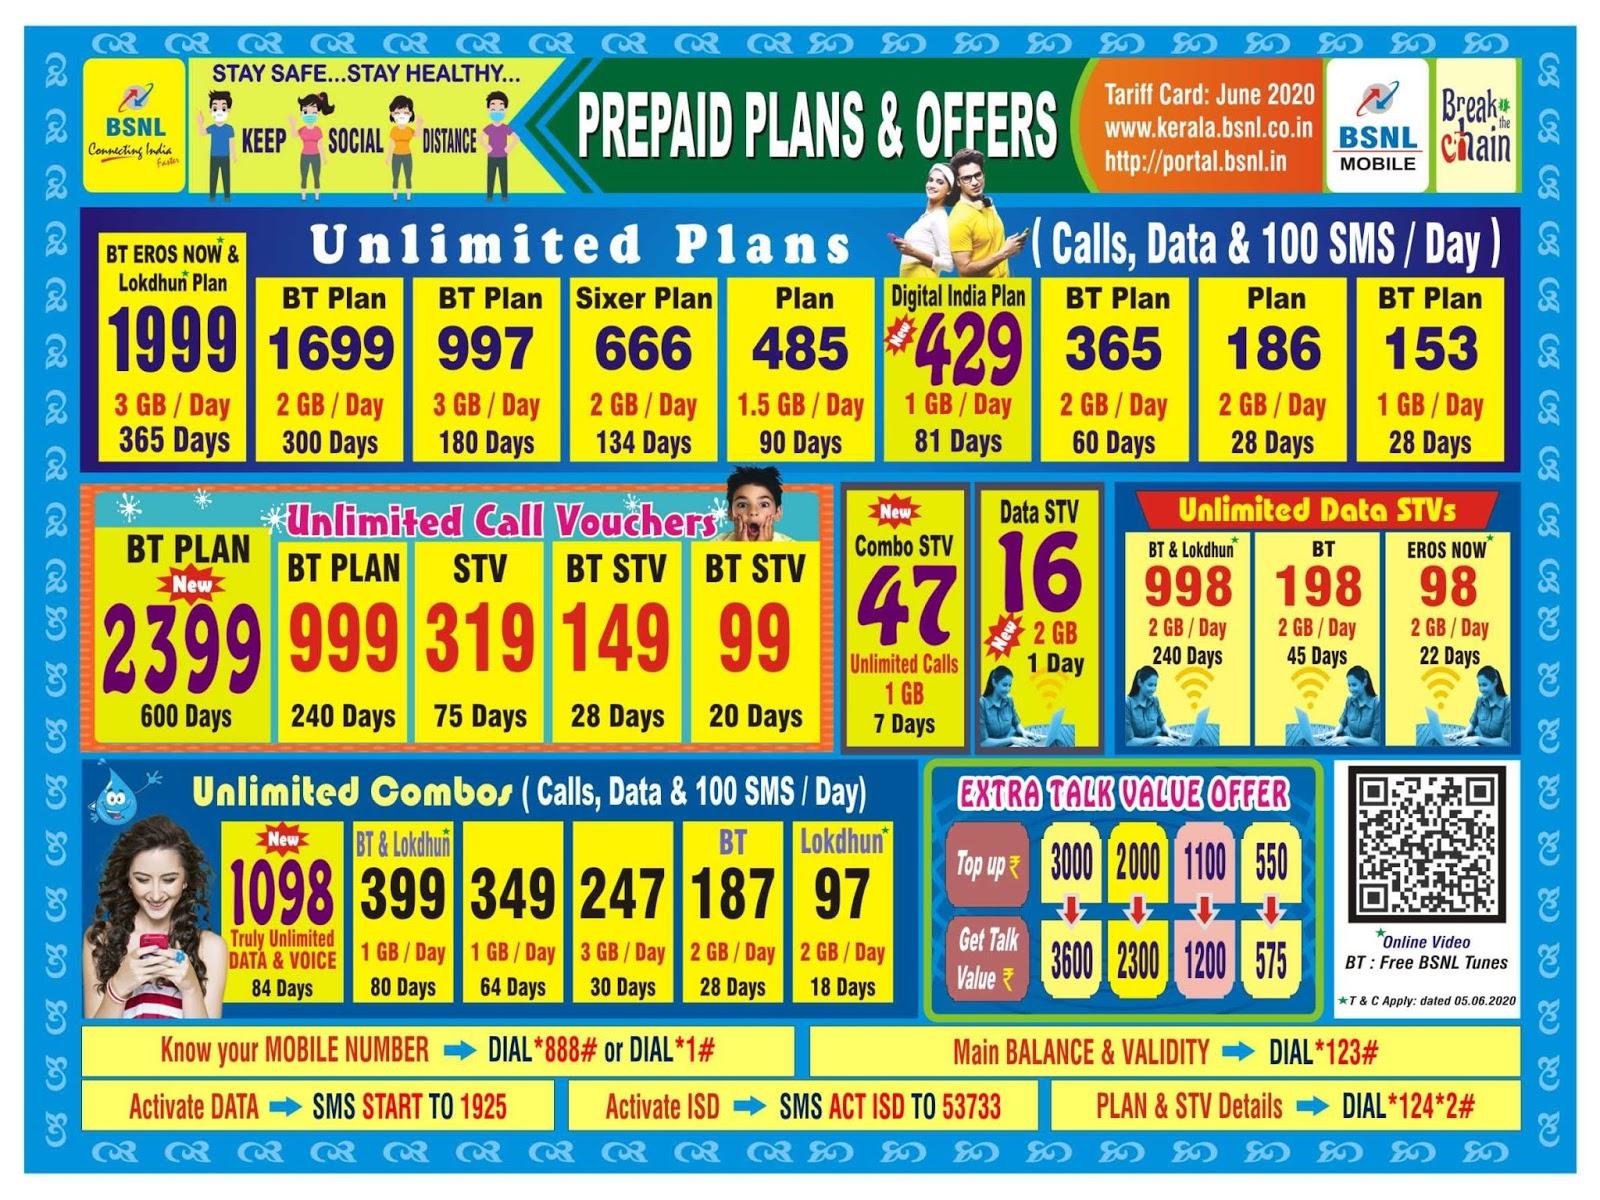 kerala bsnl mobile offers June 2020